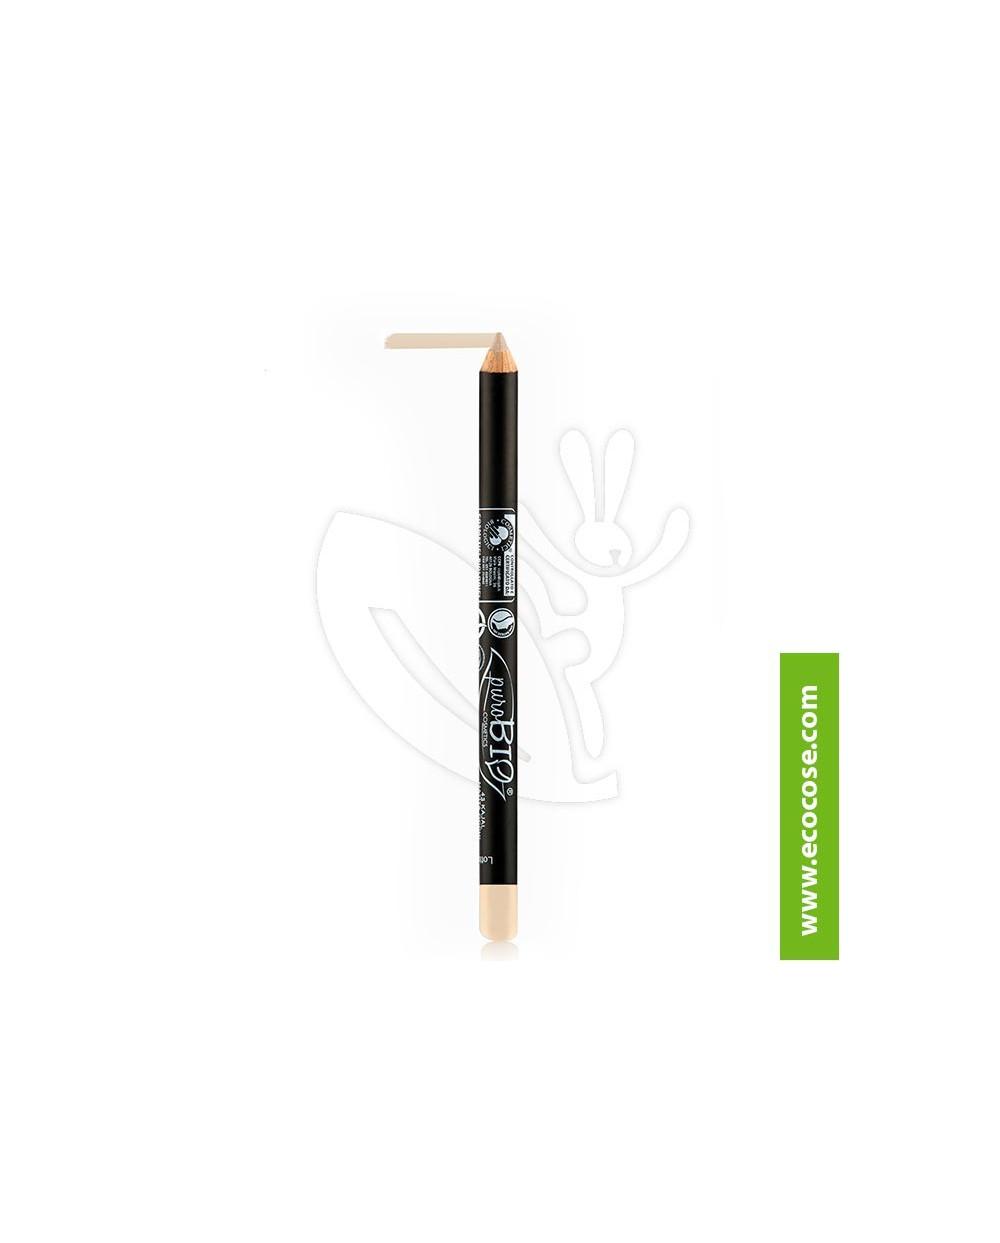 PuroBIO Cosmetics - Matita Biologica Occhi 43 Nude